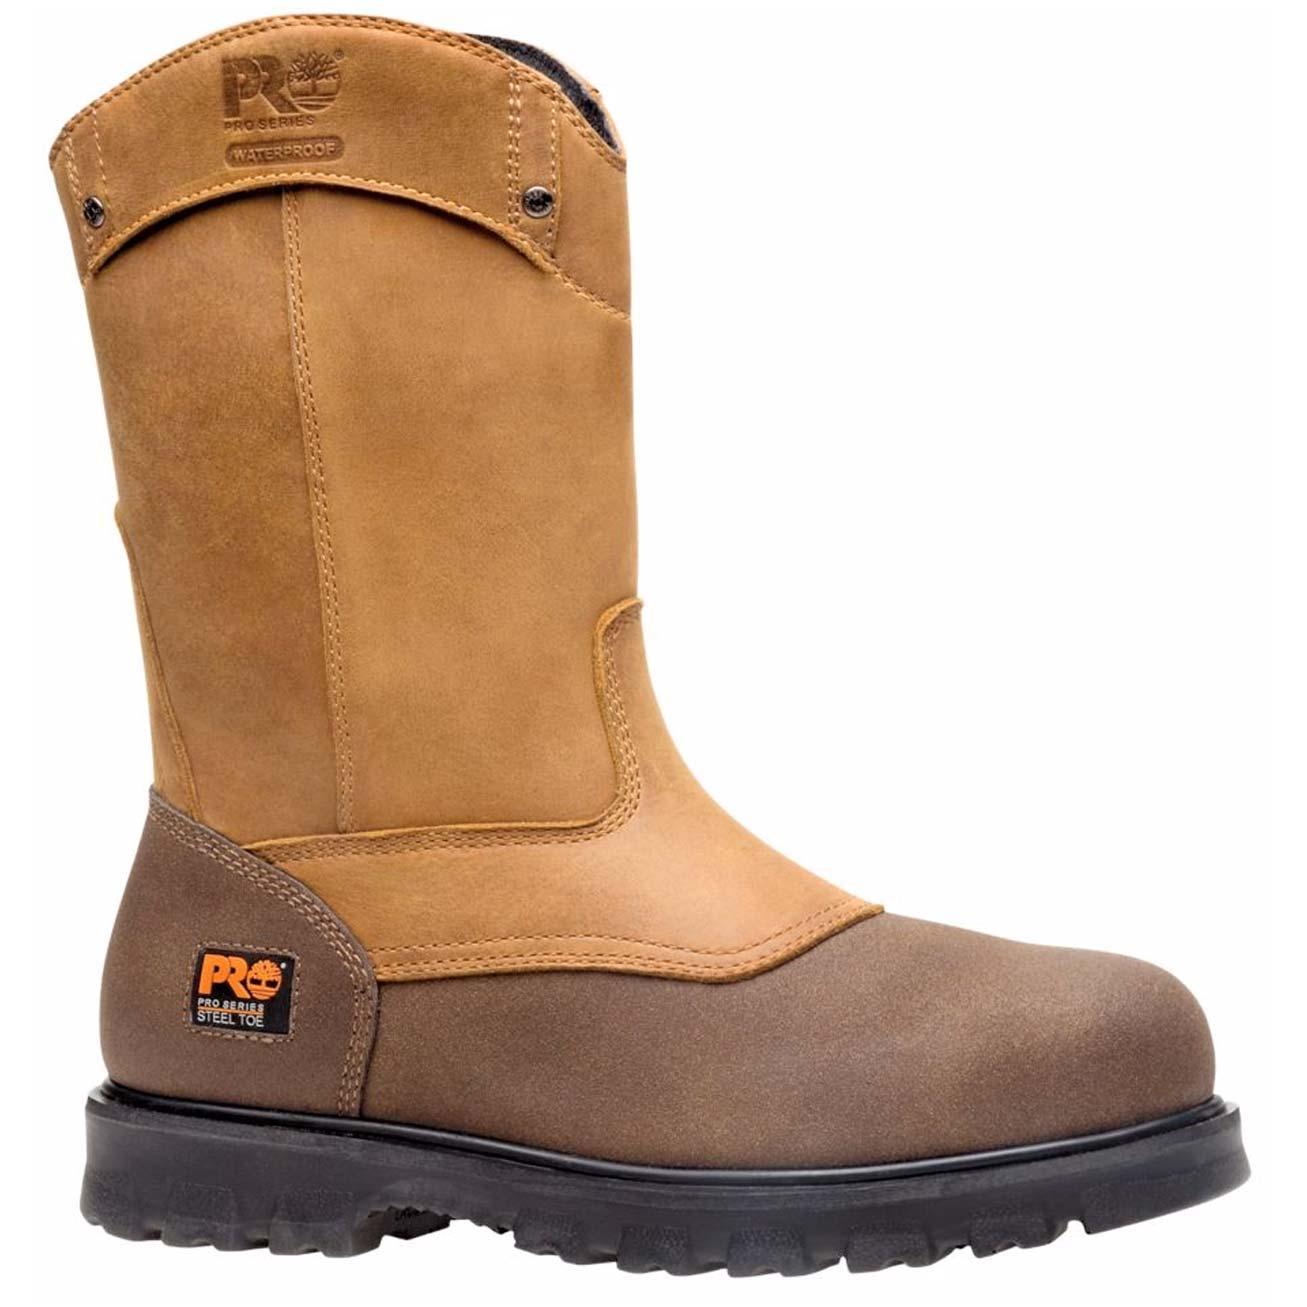 623160bc23d Timberland PRO Rigmaster Steel Toe Waterproof Wellington Work Boot